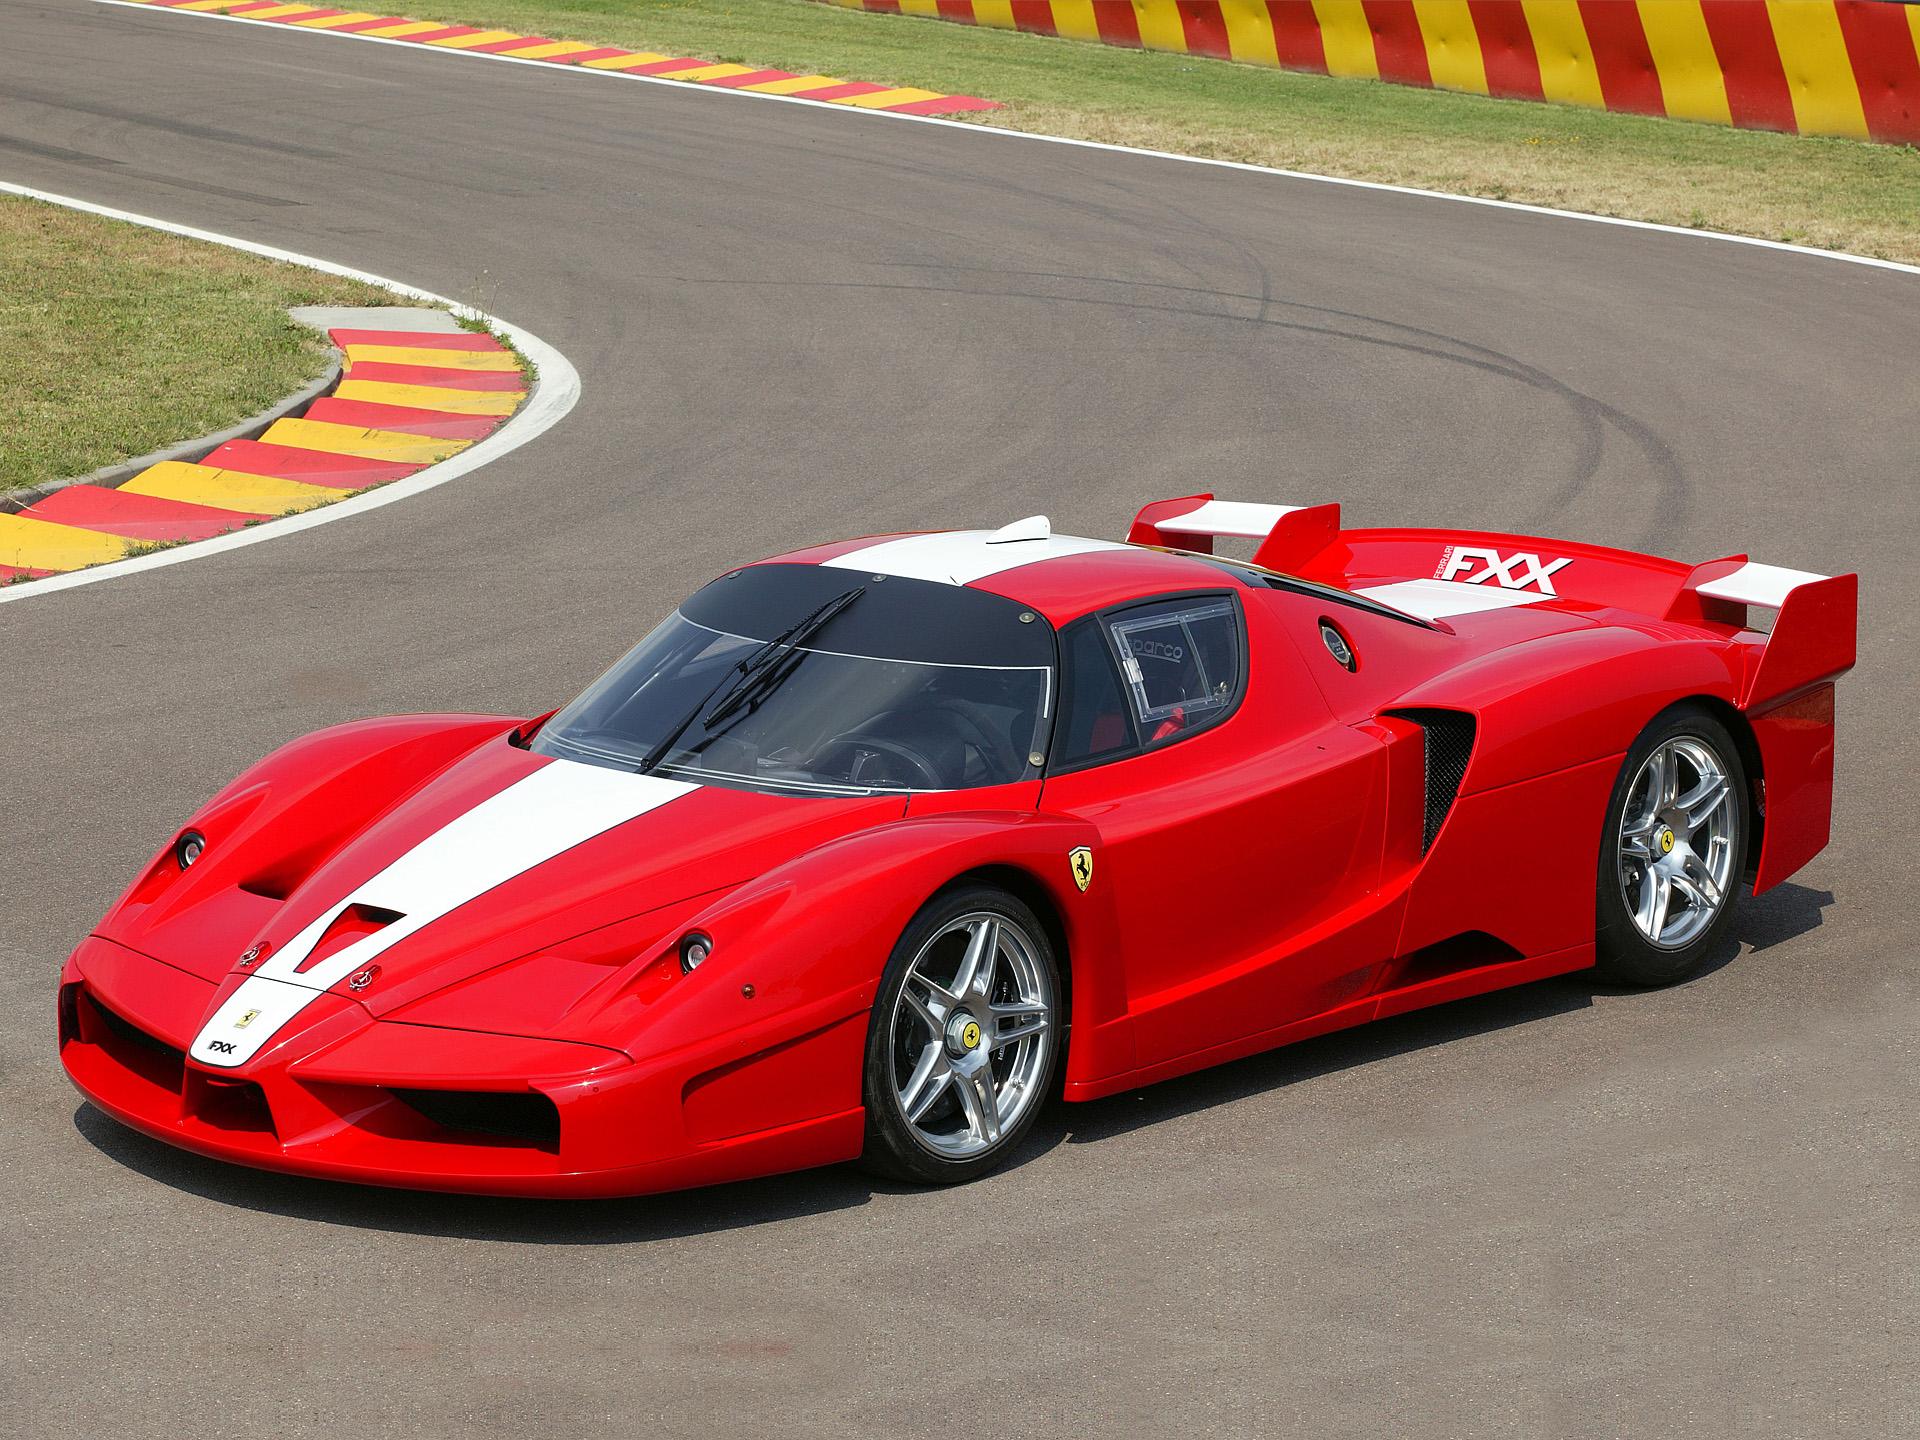 Ferrari Omologato is a One-Off ultra exclusive V12 GT